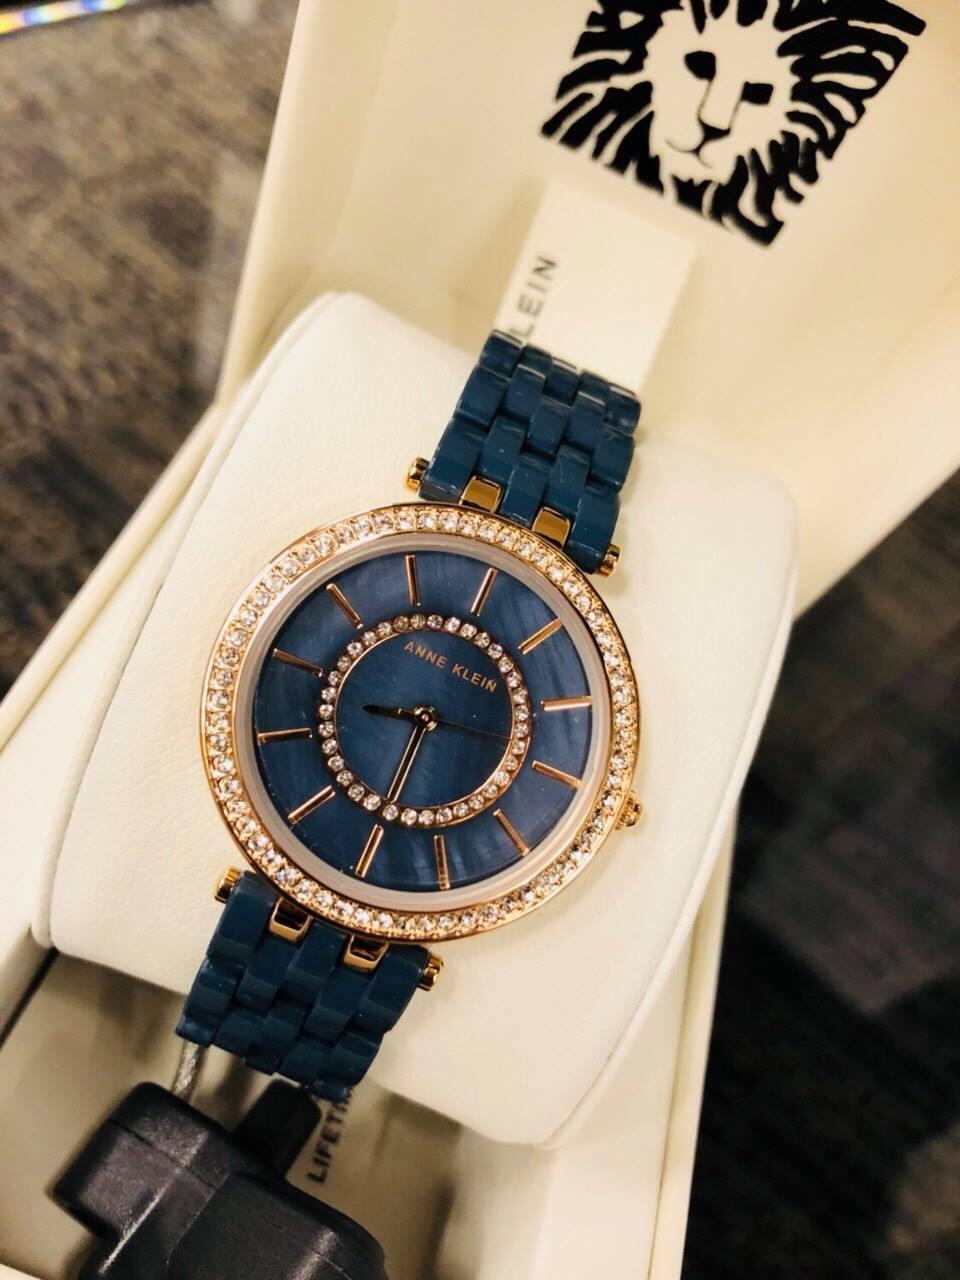 Đồng hồ nữ Anne Klein AK/2620NVRG Swarovski Navy Blue Resin Bracelet Watch 1